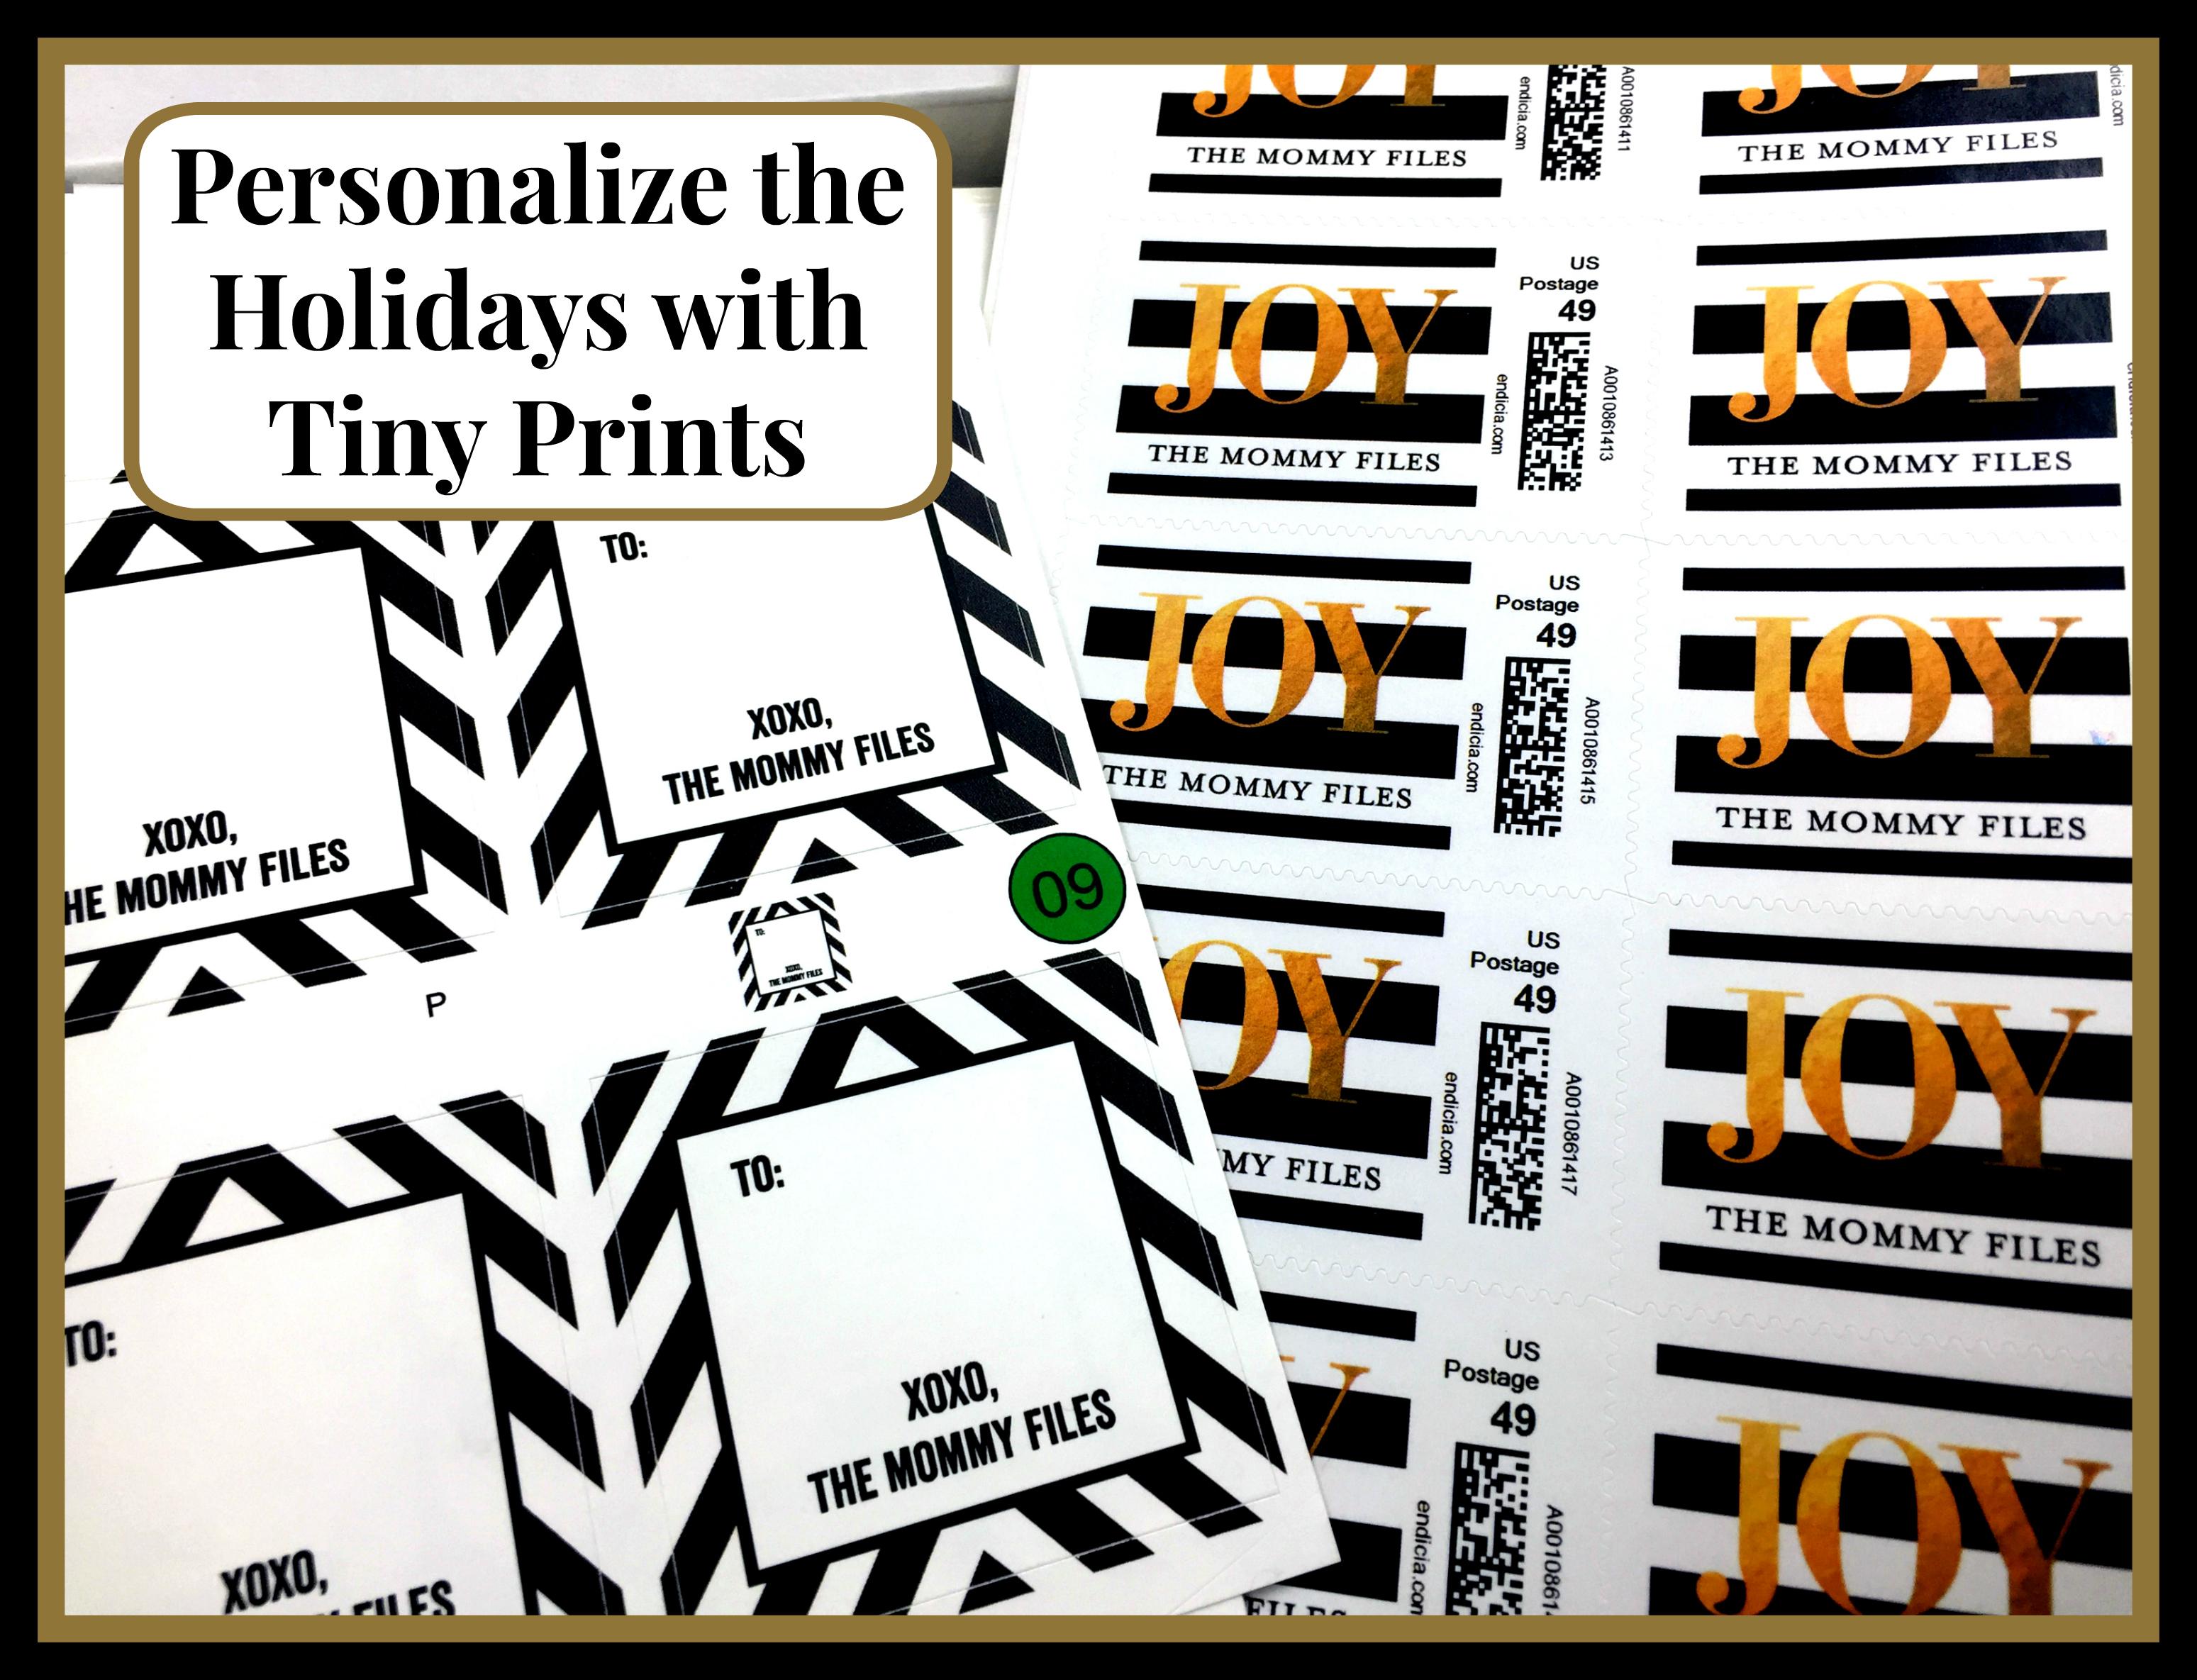 #TinyPrints #Holidays #ad